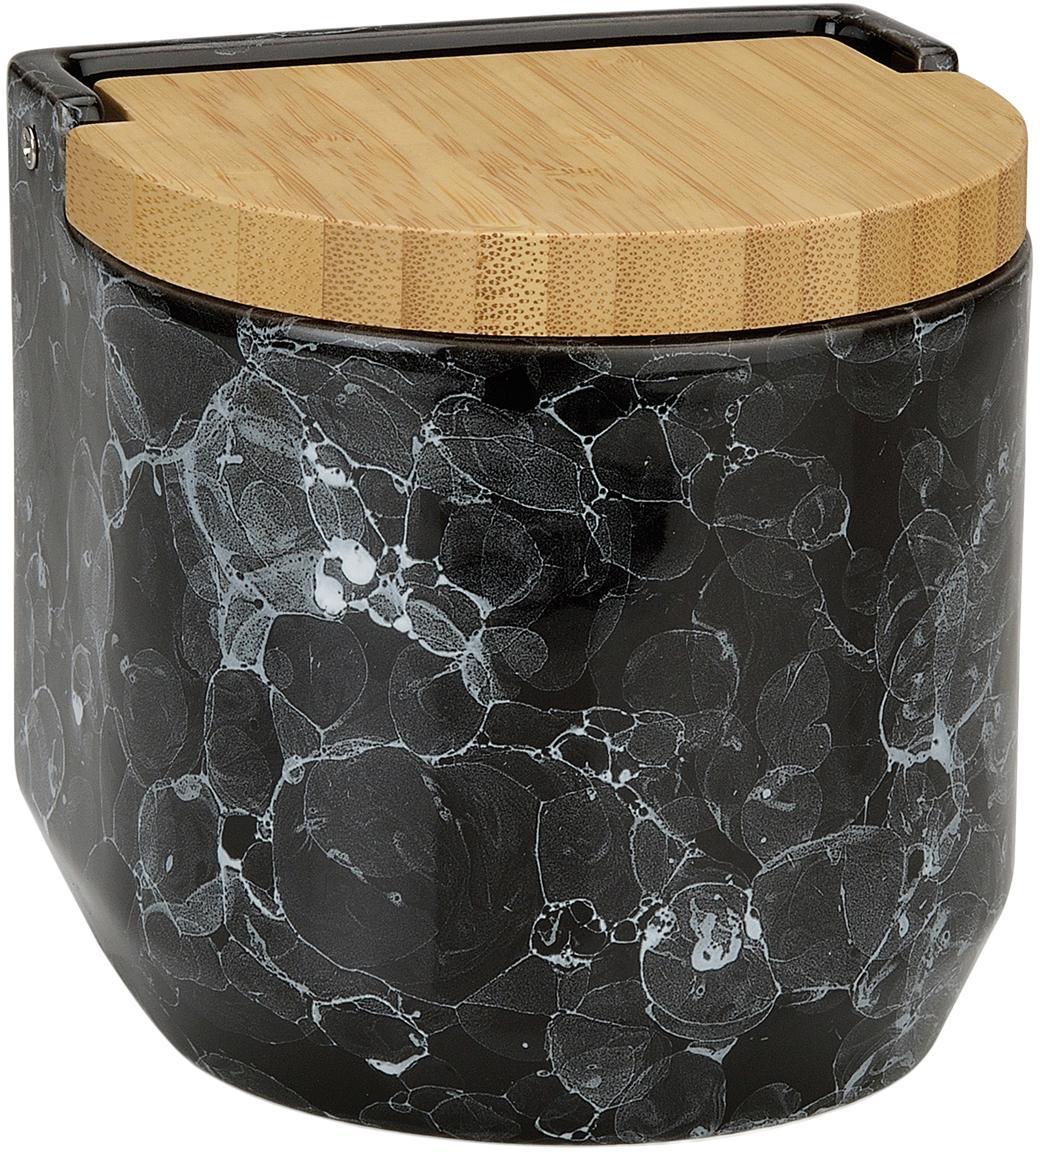 Aufbewahrungsdose Bubble in Marmor-Optik mit Bambusdeckel, Keramik, Bambus, Schwarz, marmoriert, Ø 12 x H 12 cm